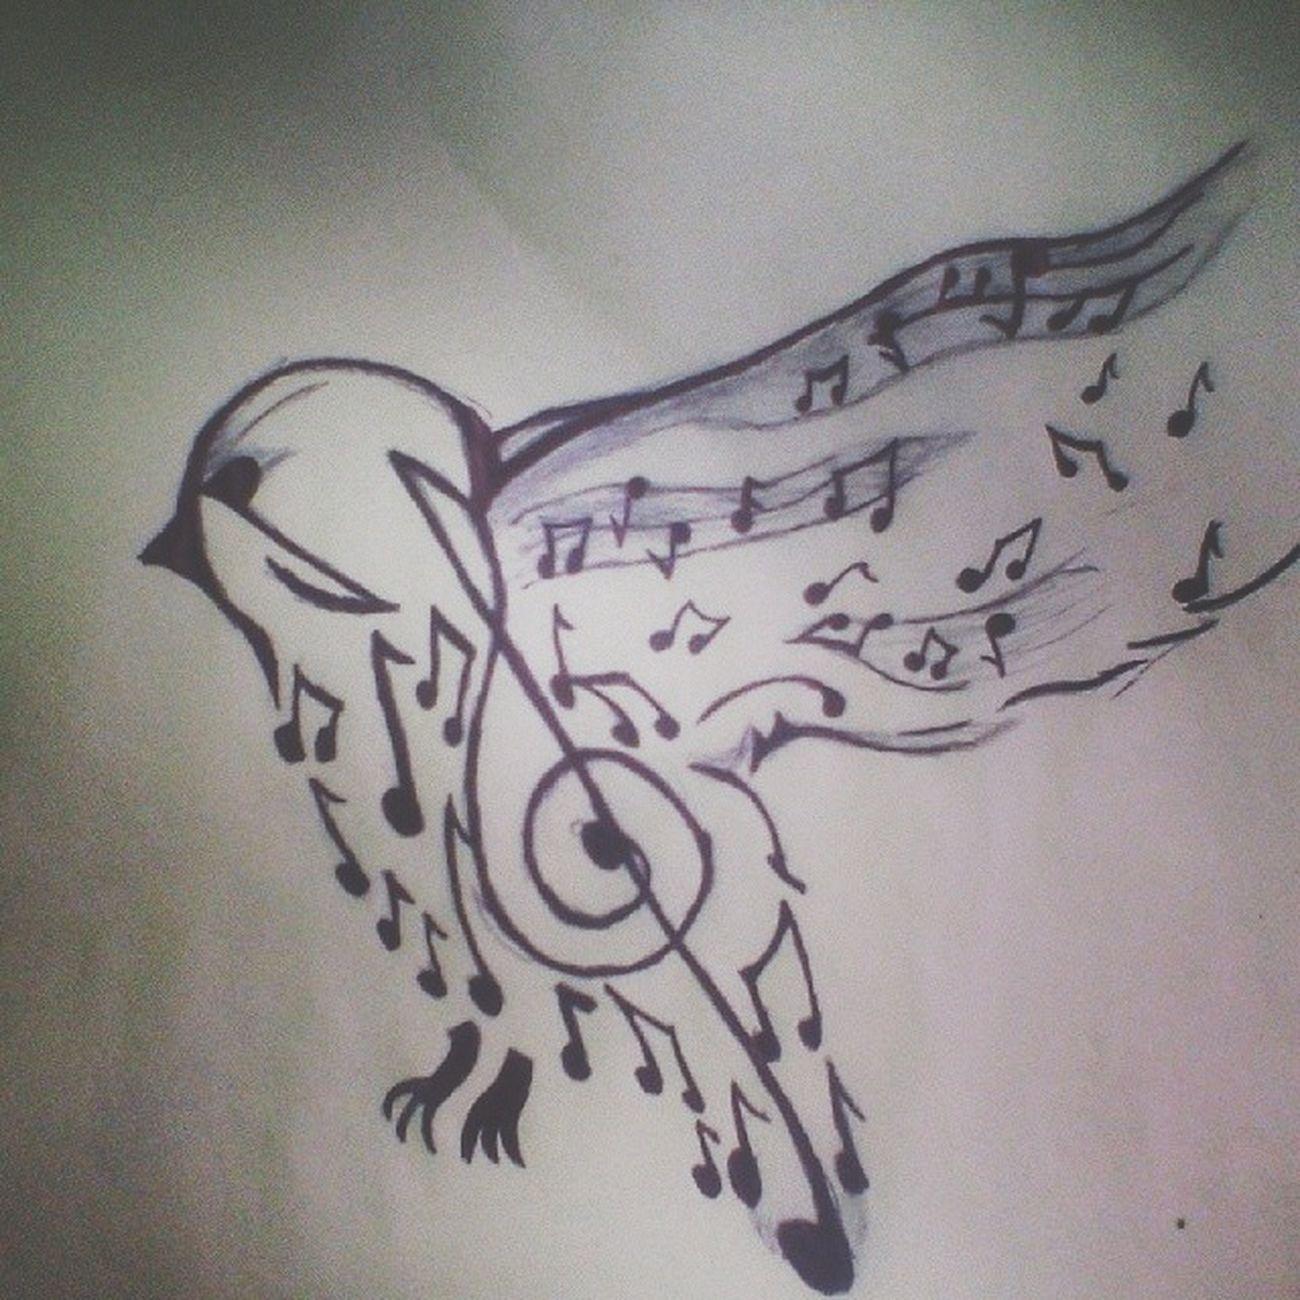 La Mente Detras Del Lapiz Dibujo Drawing Dibujo A Lapiz Drawingtime Art, Drawing, Creativity Mis Dibujos Draw Arte Artistic